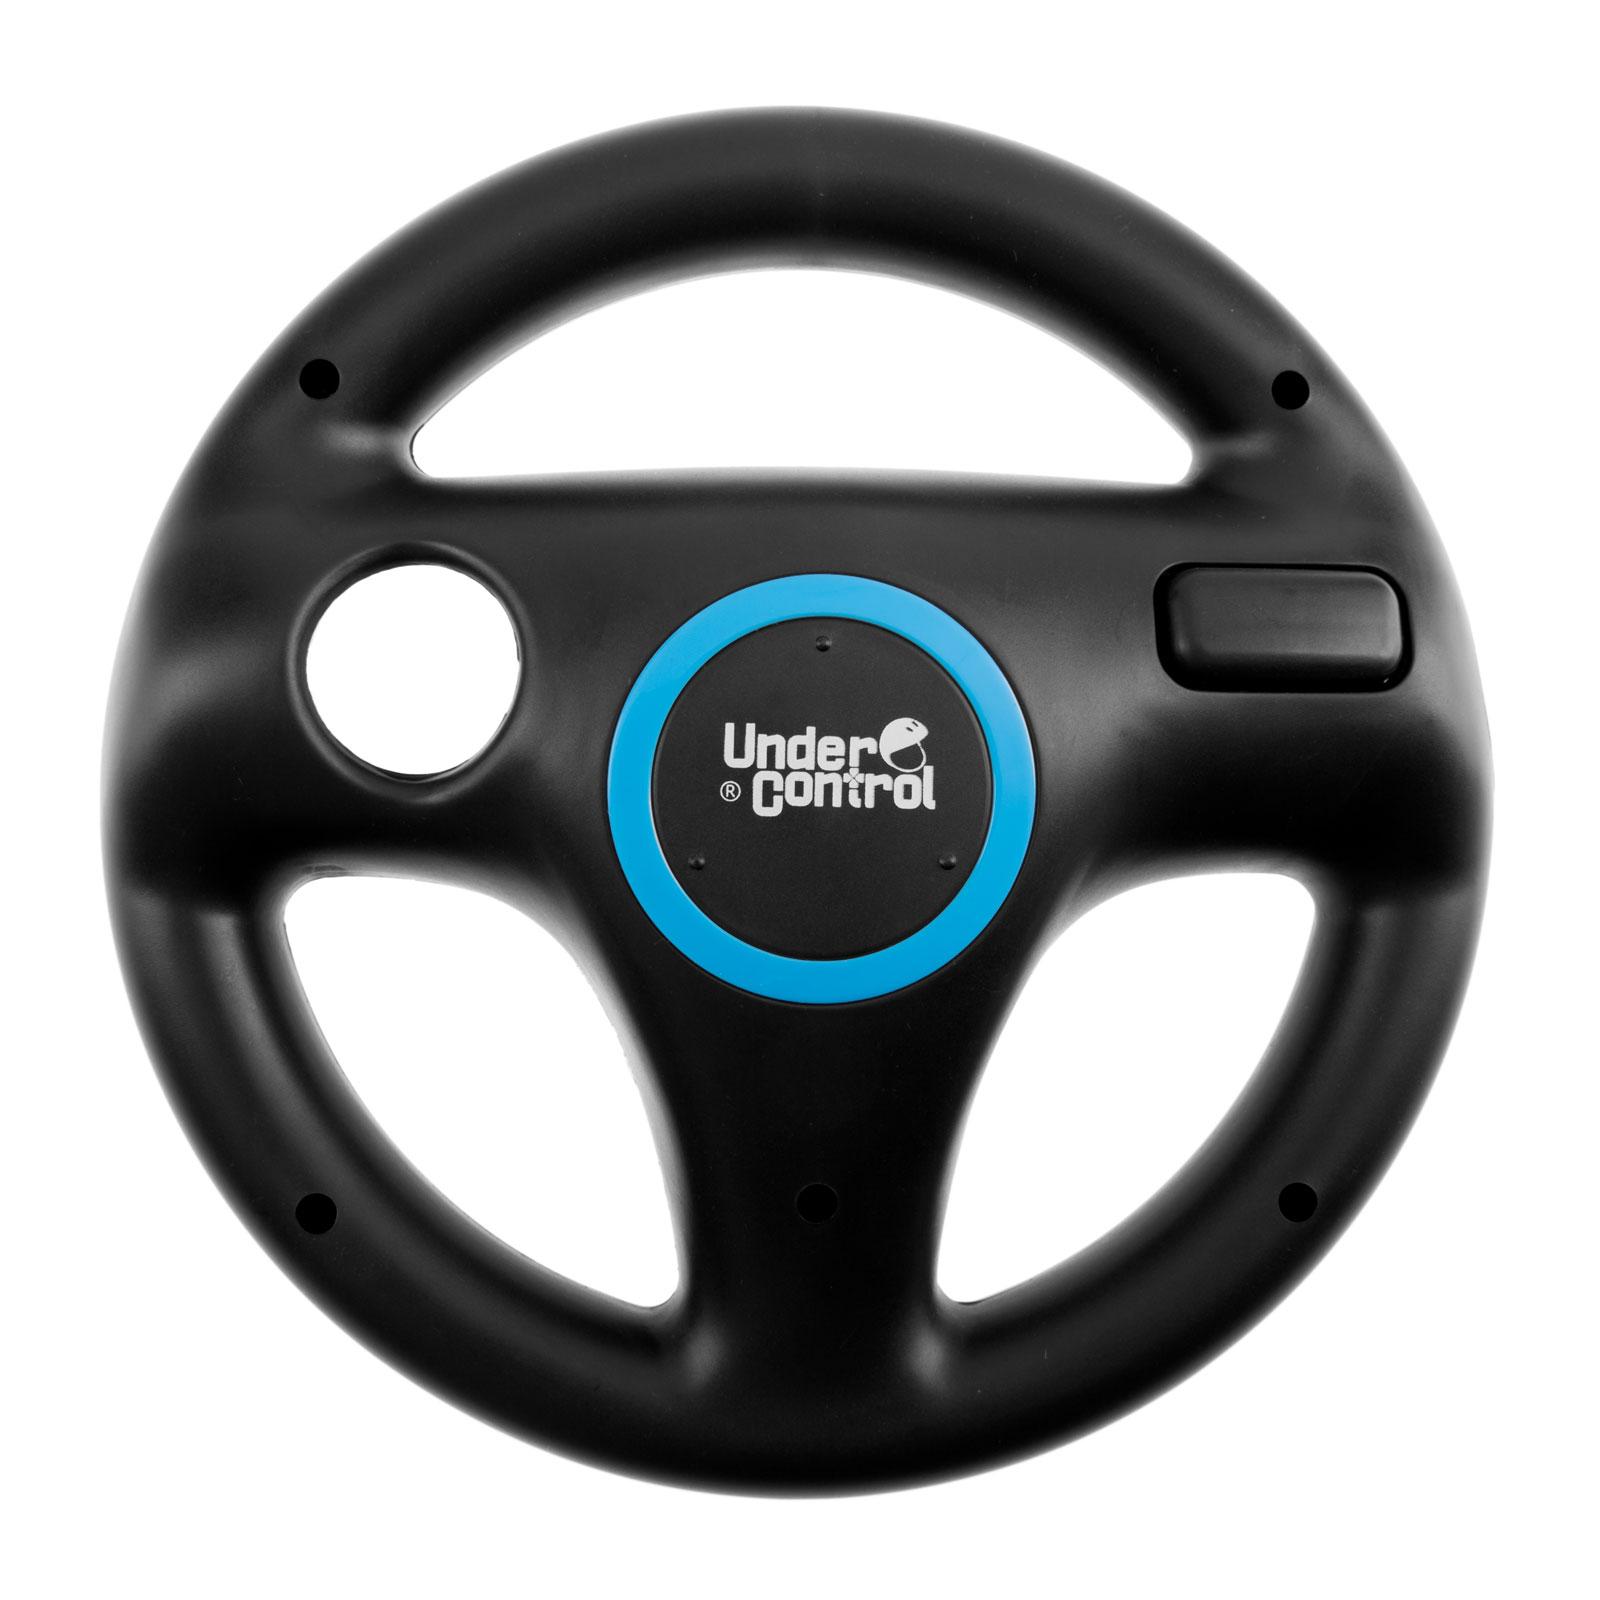 under control steering wheel noir accessoires wii u under control sur. Black Bedroom Furniture Sets. Home Design Ideas